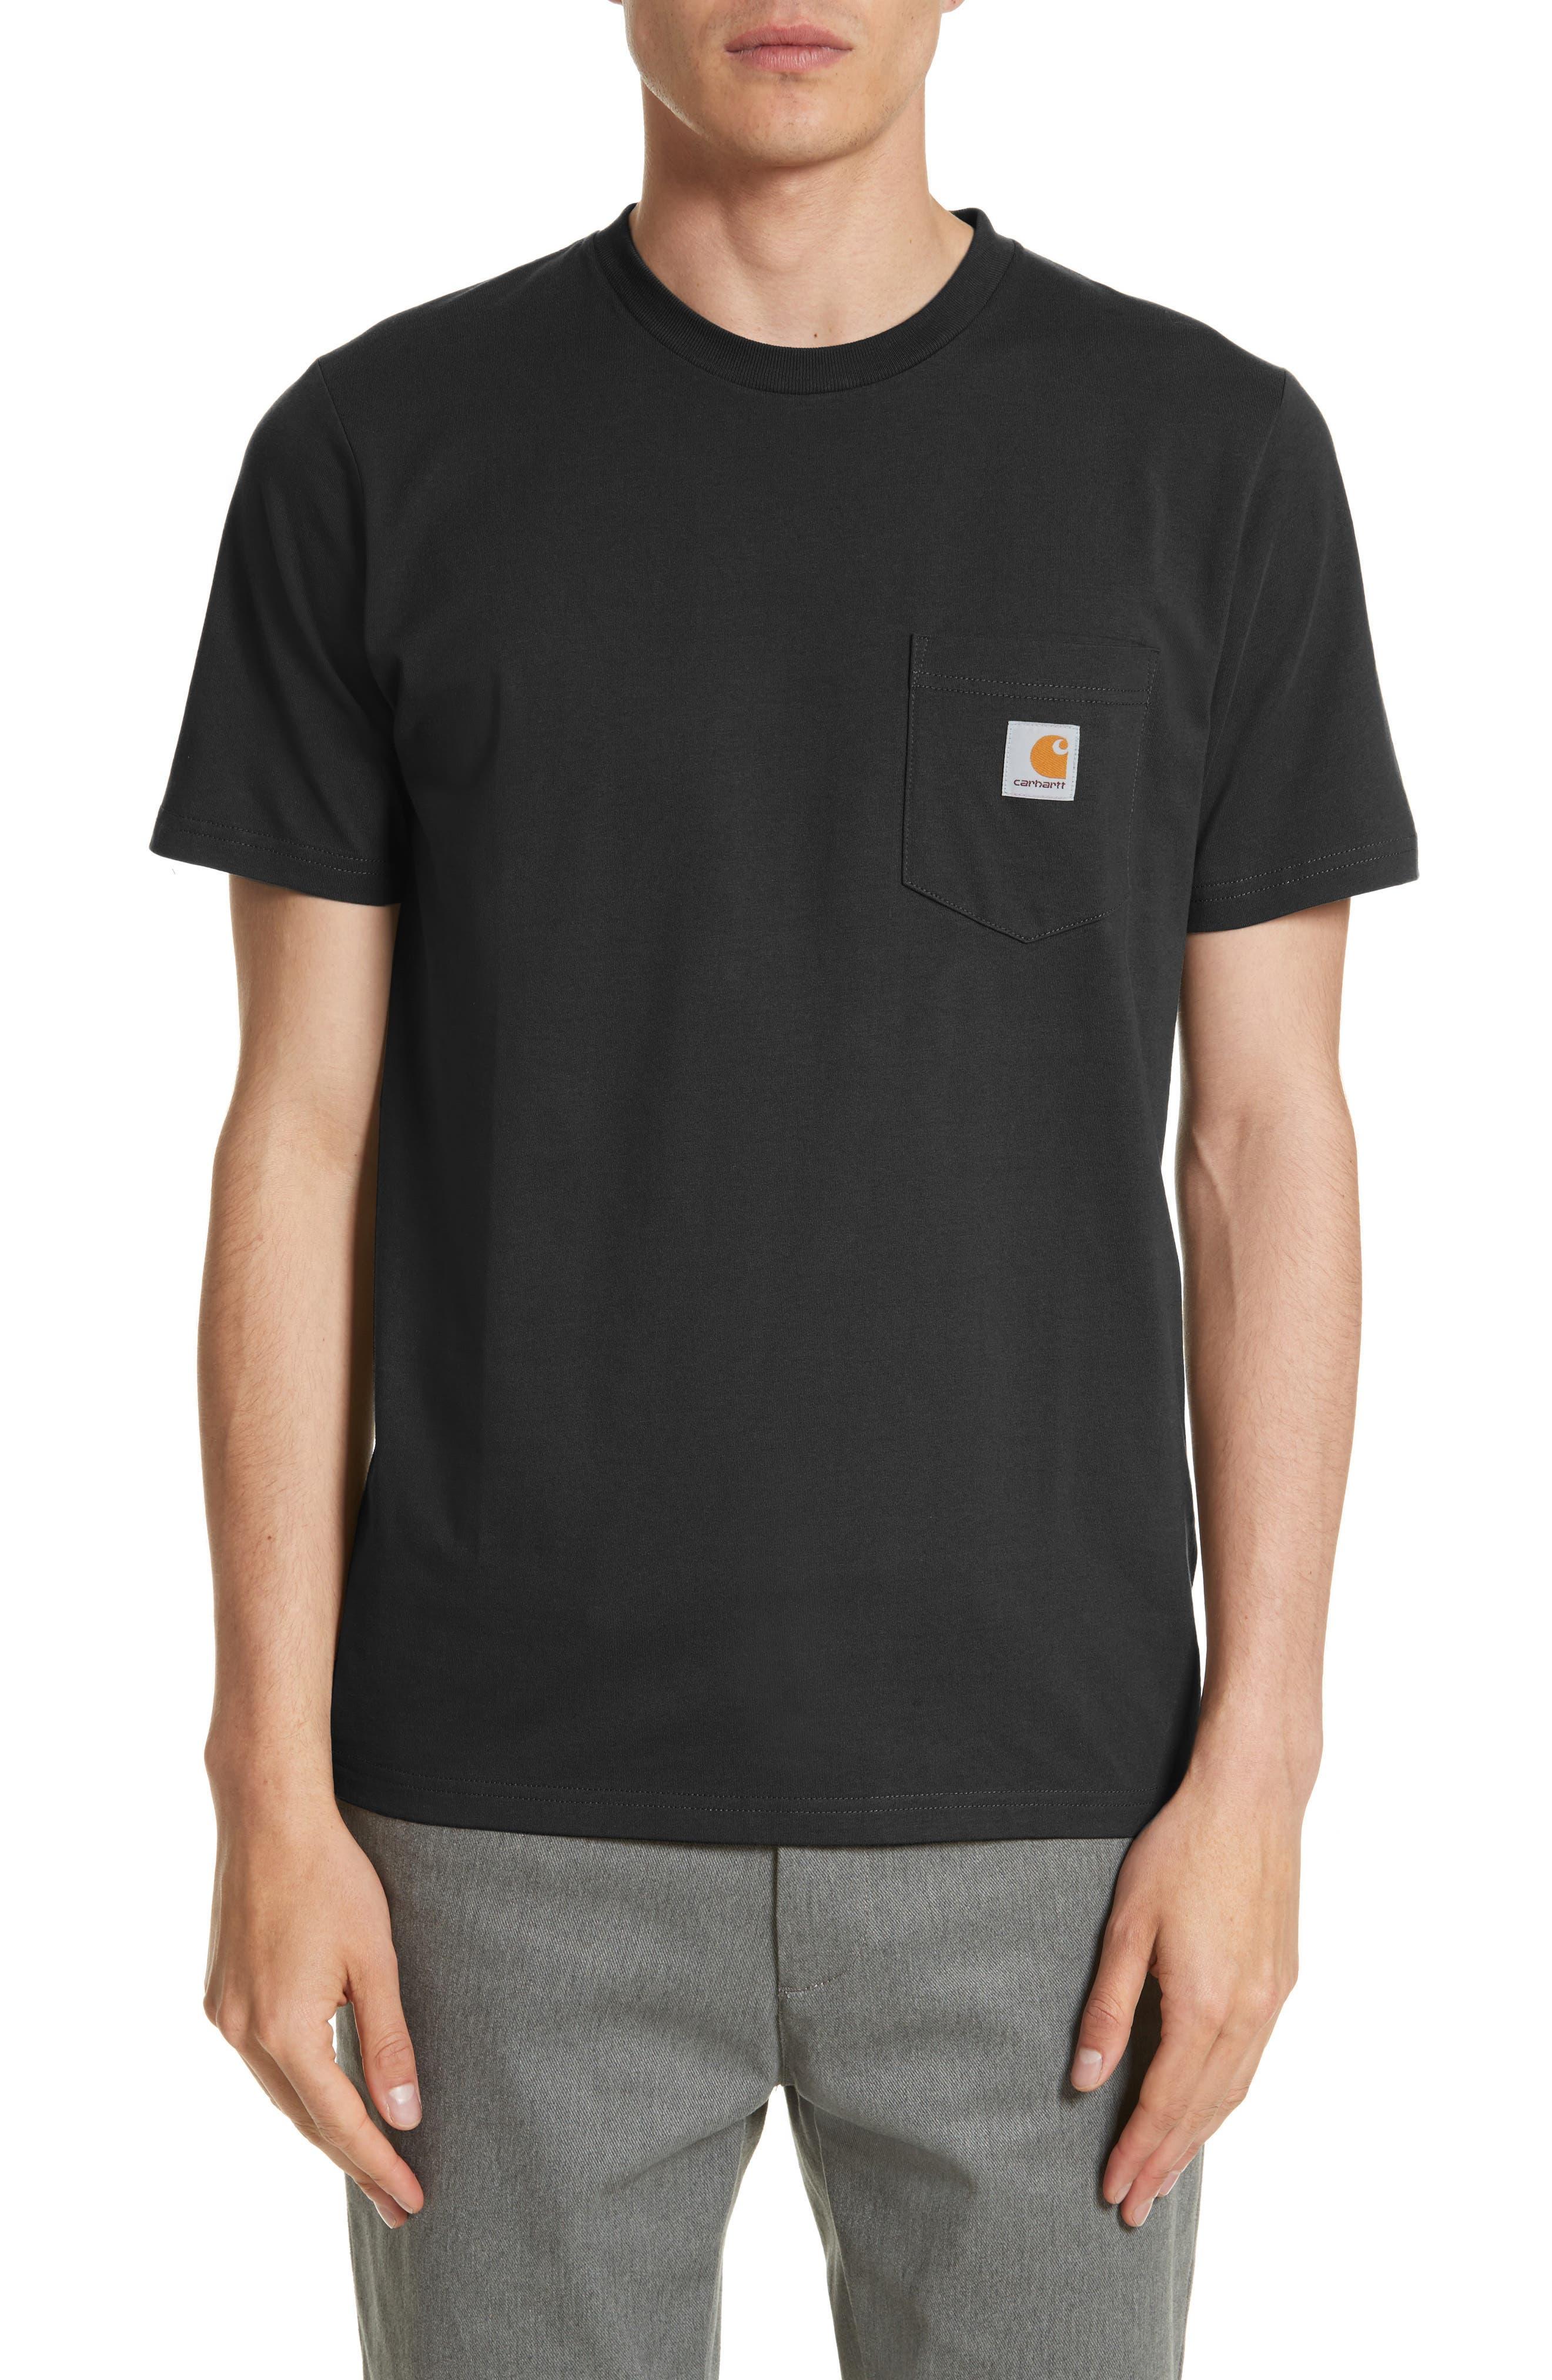 CARHARTT WORK IN PROGRESS, Logo Pocket T-Shirt, Main thumbnail 1, color, BLACK